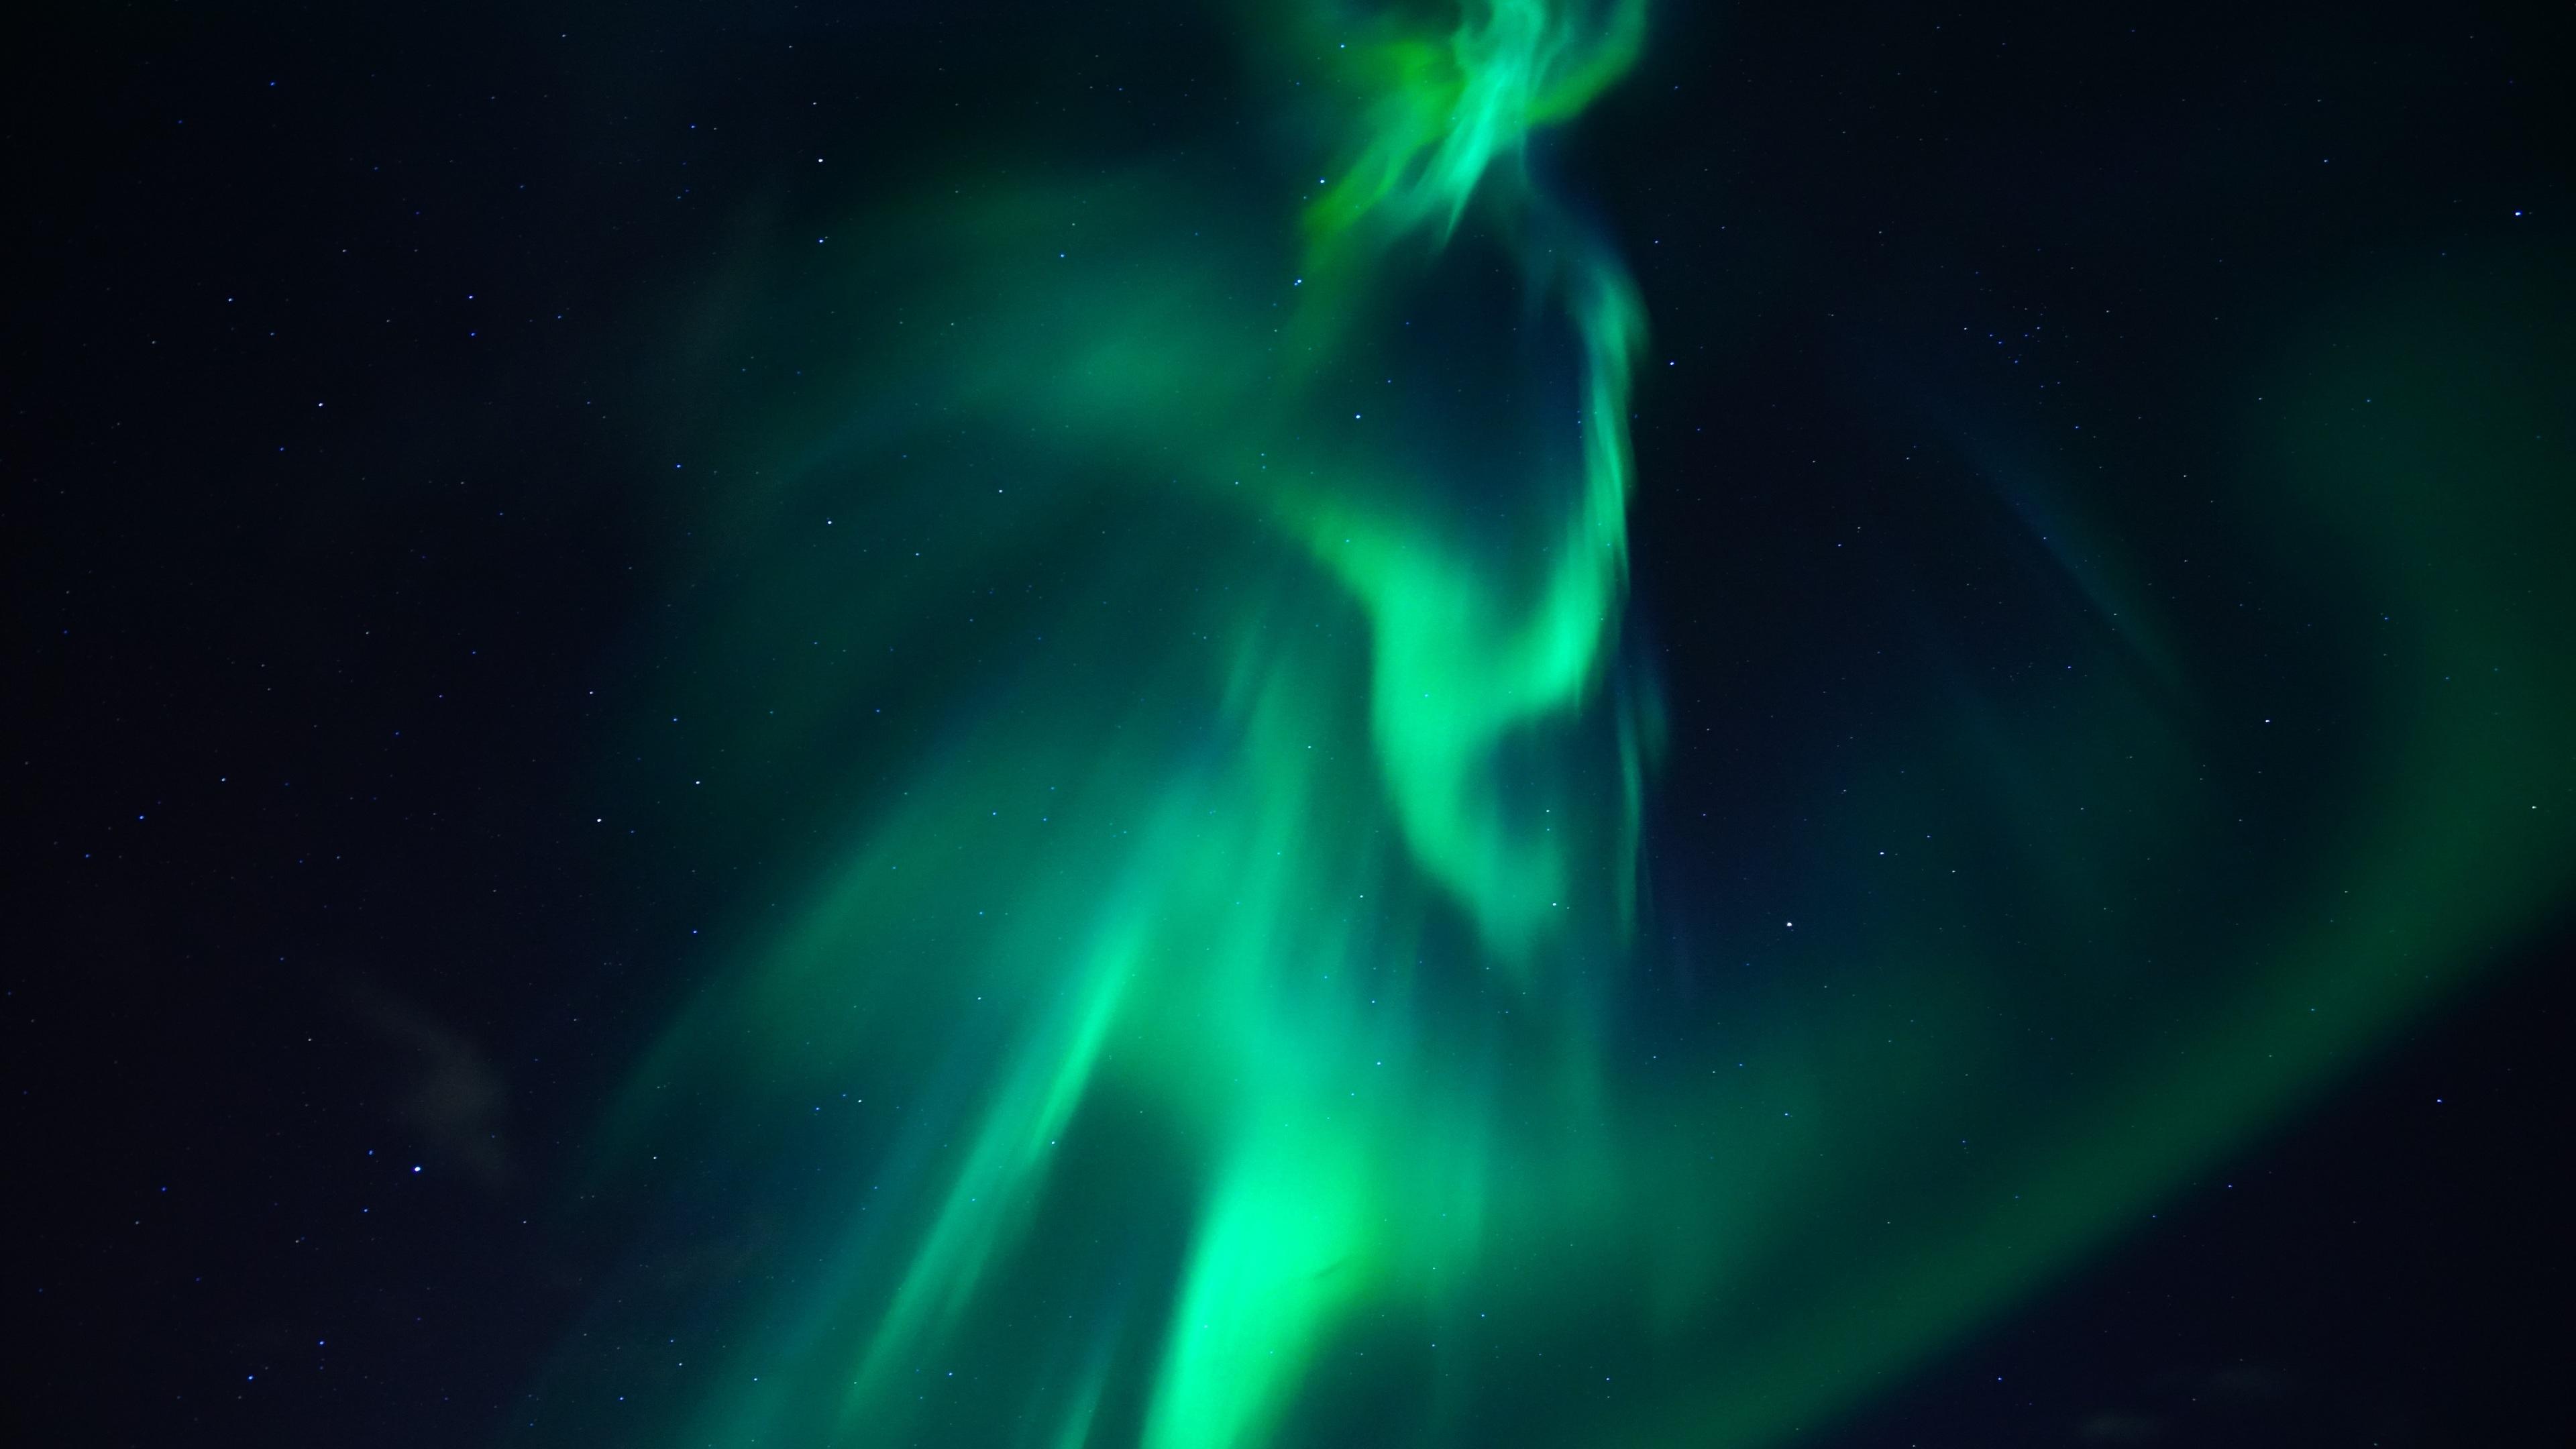 4k northern lights aurora 1540139305 - 4k Northern Lights Aurora - northern lights wallpapers, nature wallpapers, hd-wallpapers, aurora wallpapers, 8k wallpapers, 5k wallpapers, 4k-wallpapers